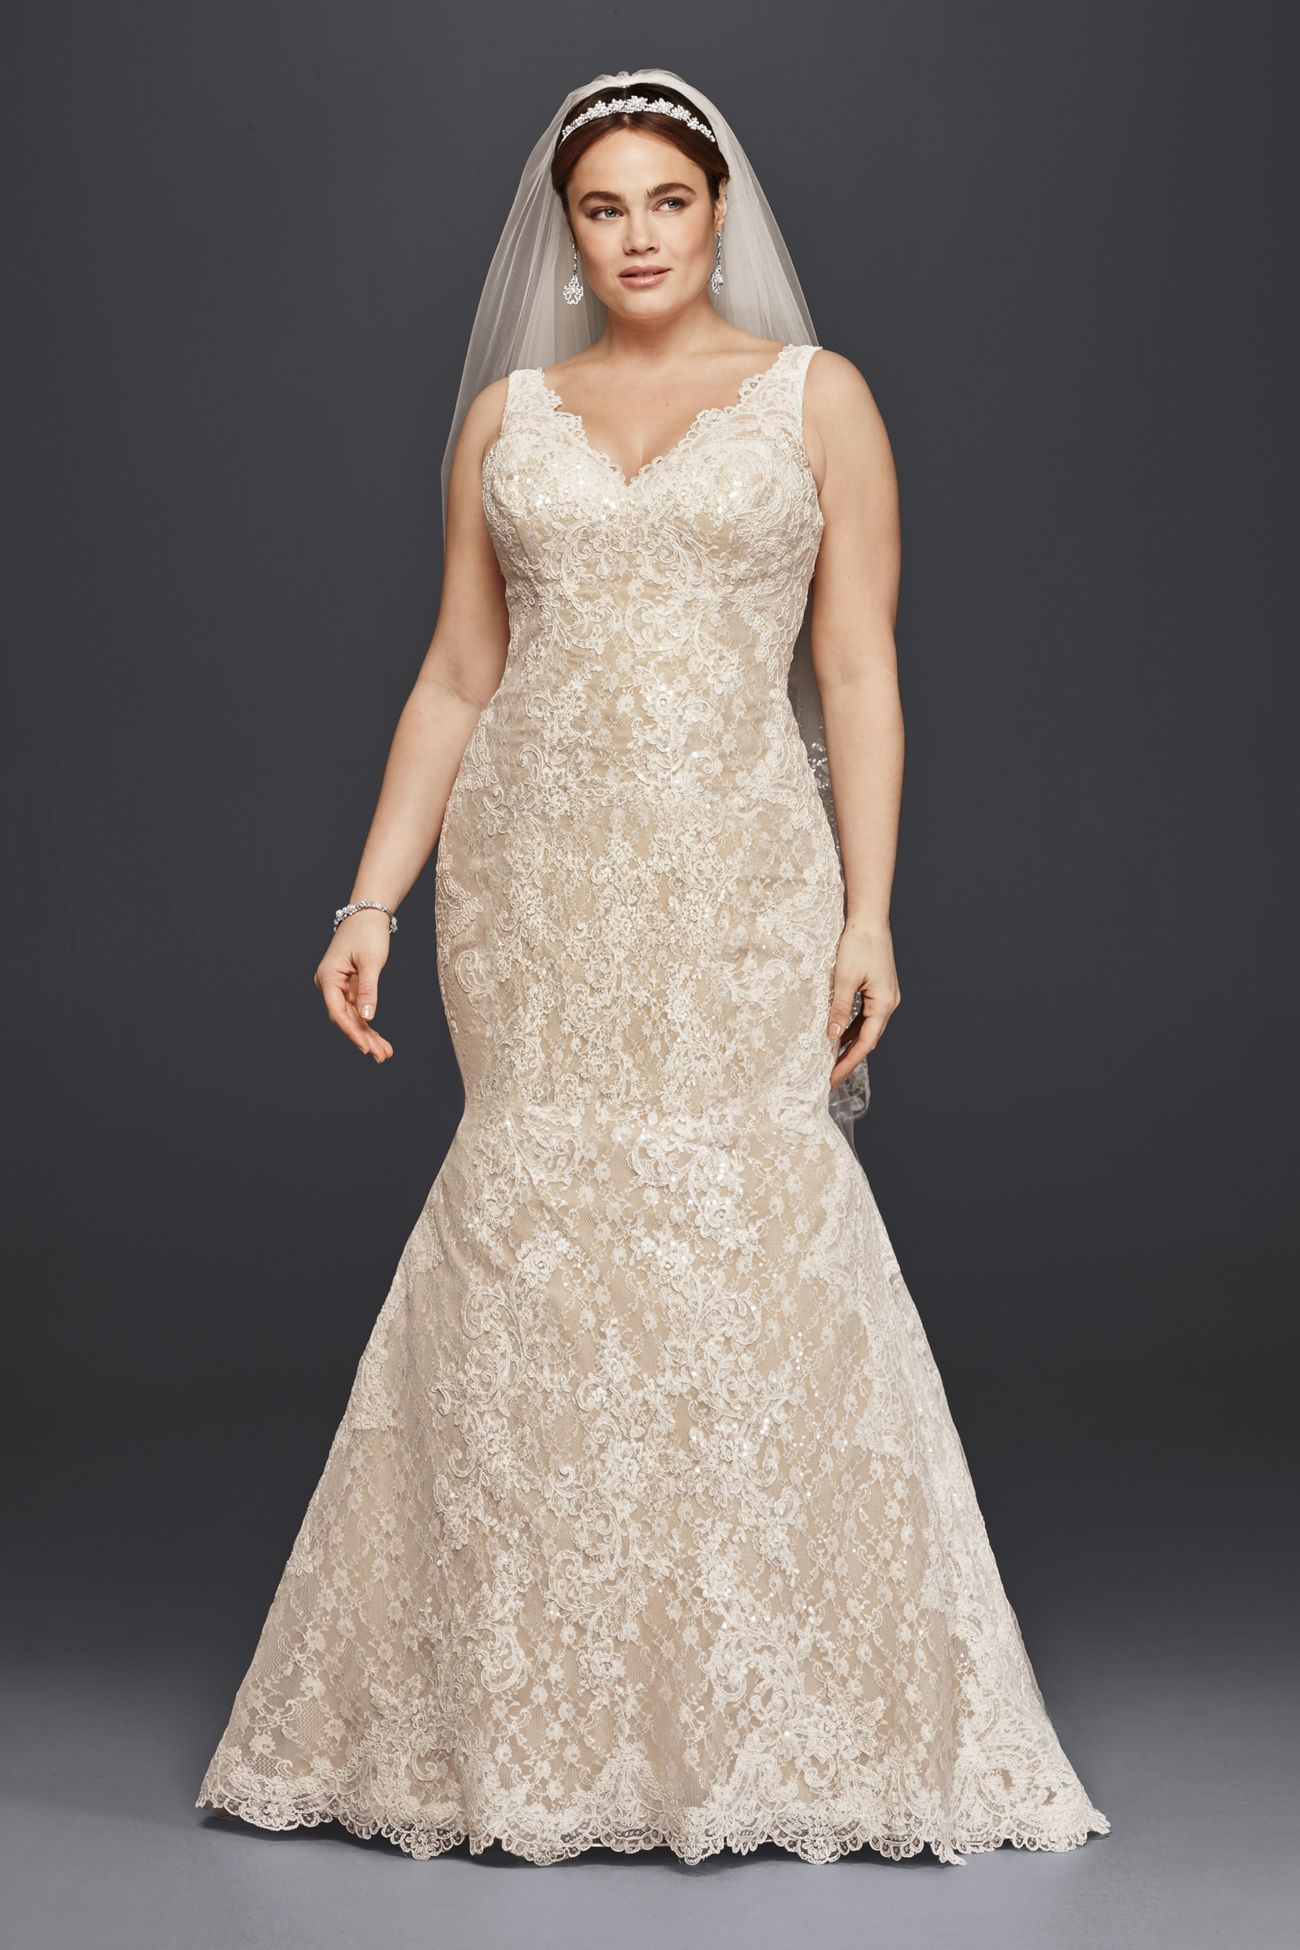 David wedding dress  CWG  Wedding gowns  Pinterest  Trumpets Wedding dress and